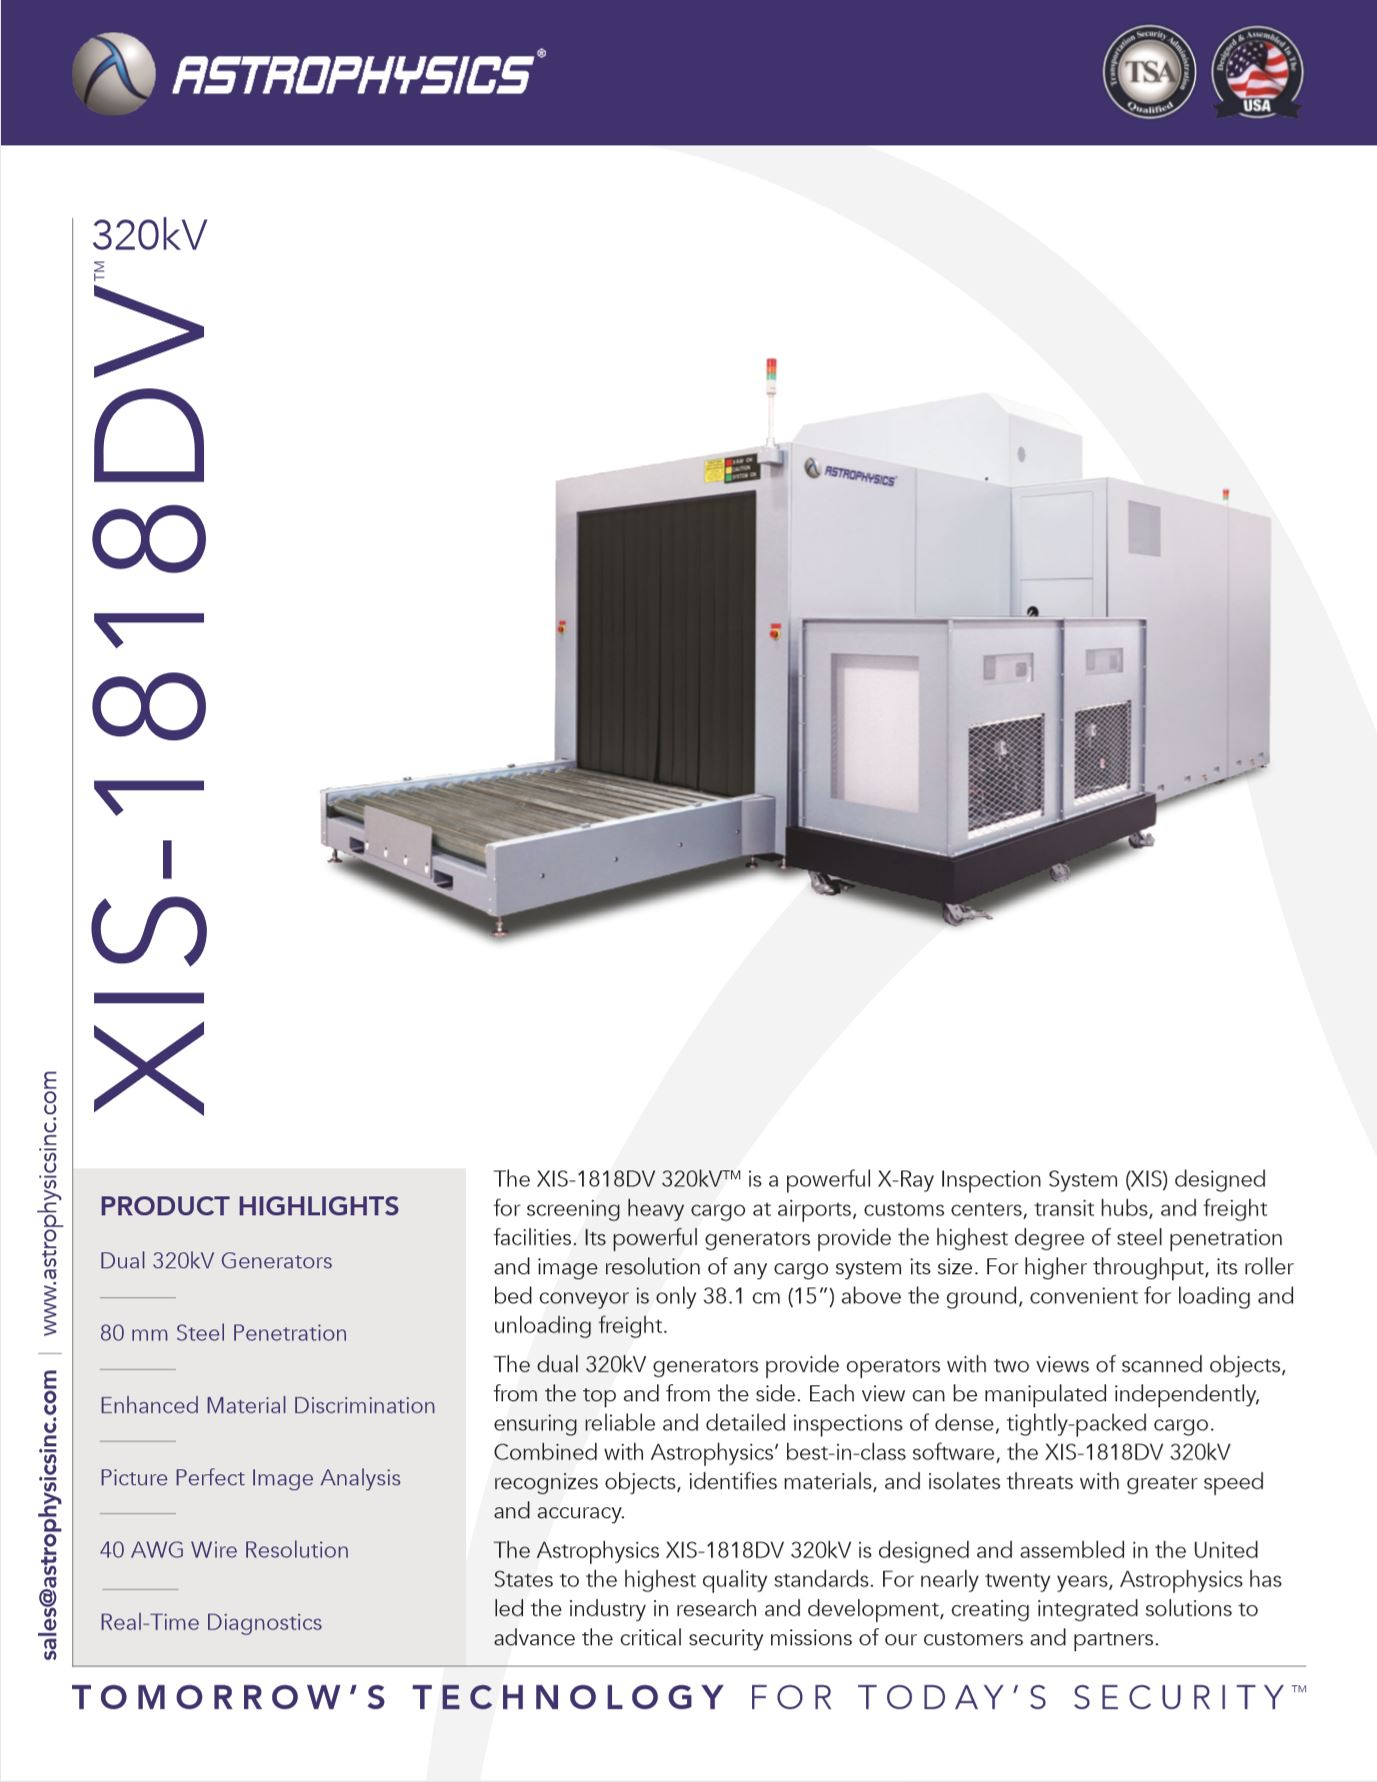 XIS-1818DV